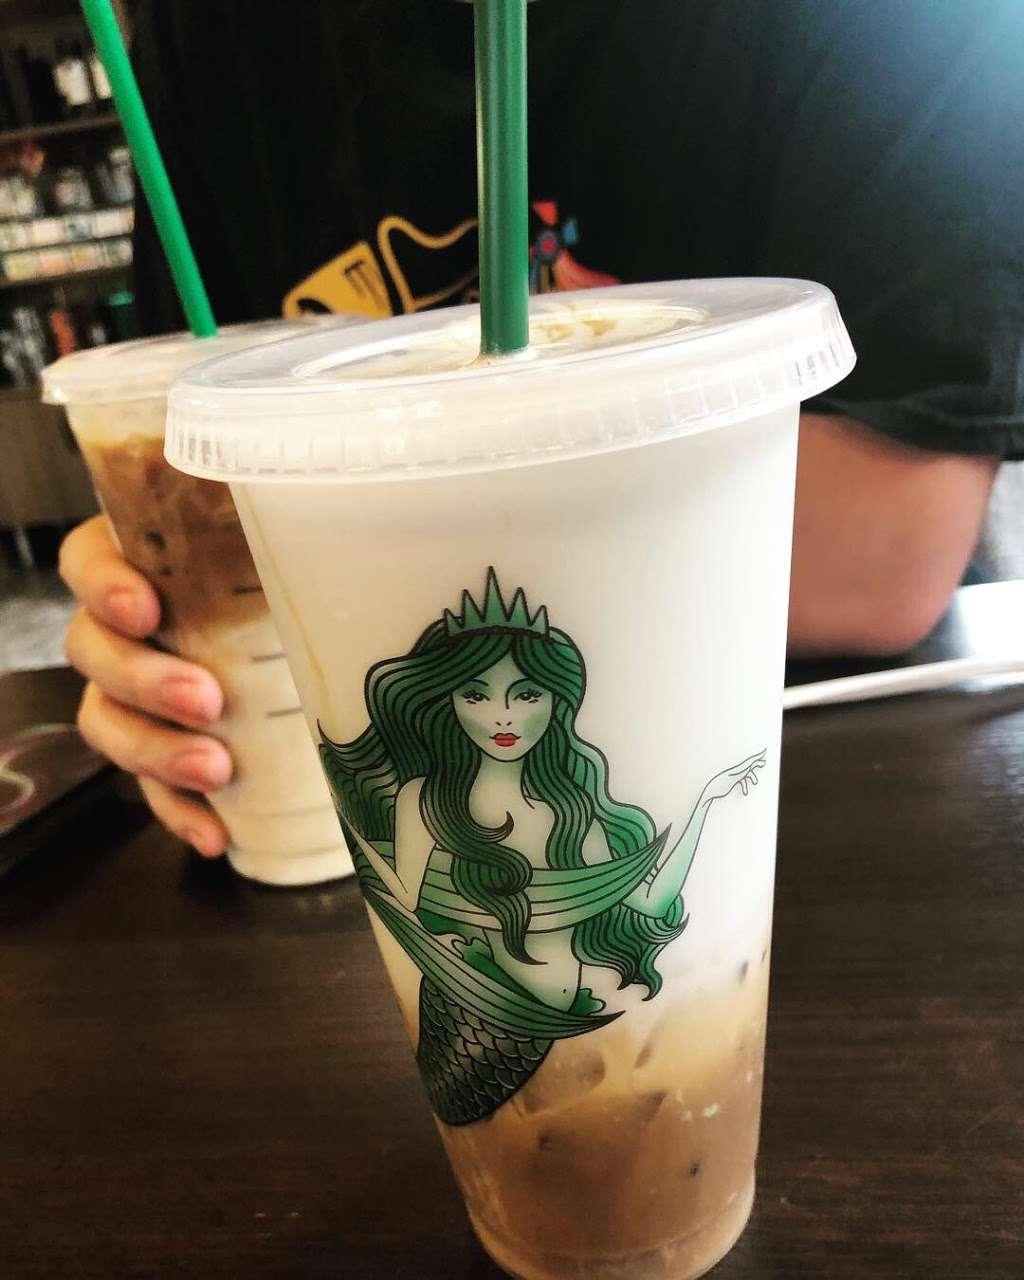 Starbucks - cafe  | Photo 6 of 9 | Address: 6768 W 95th St, Oak Lawn, IL 60453, USA | Phone: (708) 430-8903